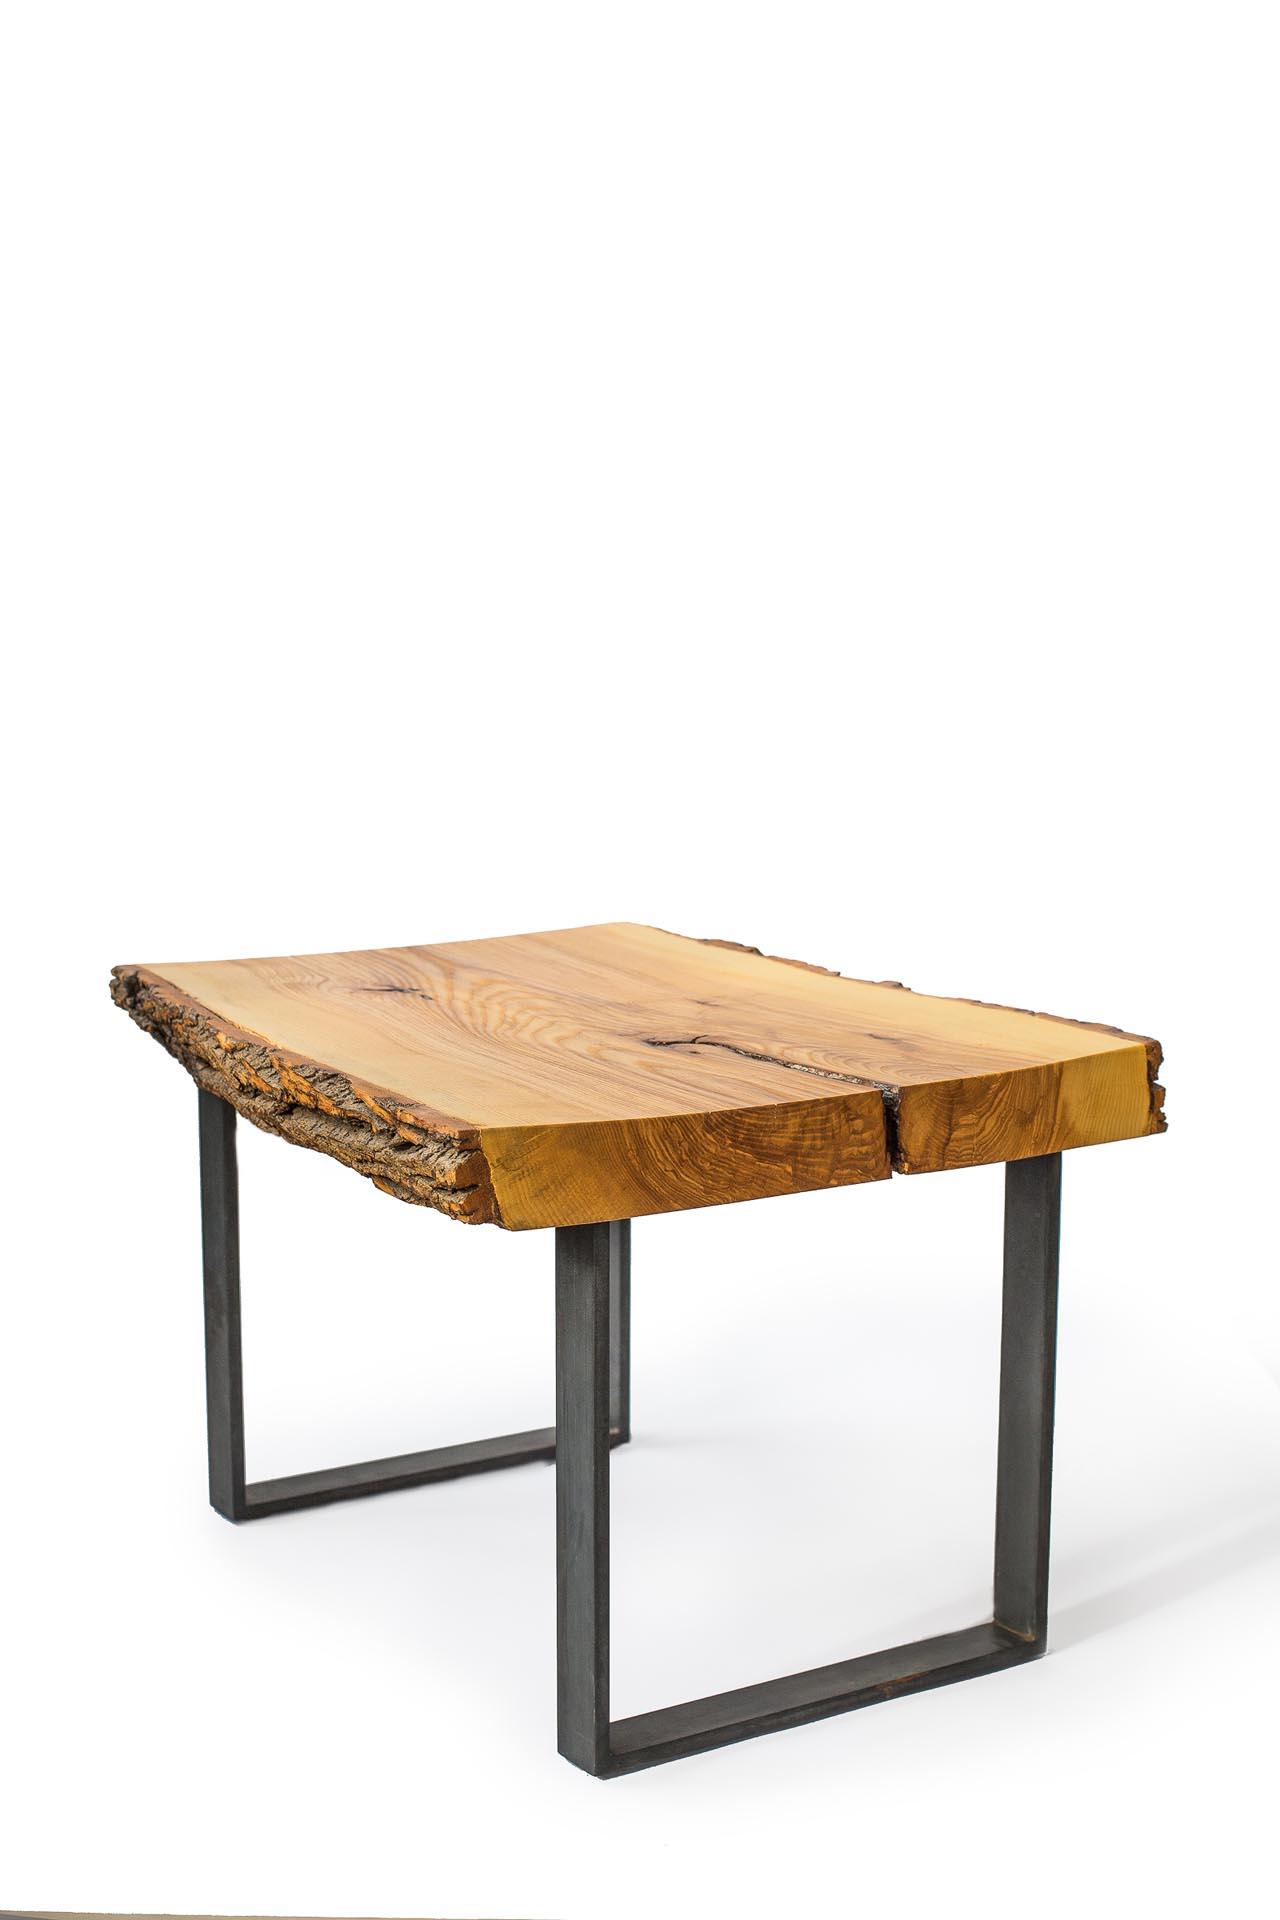 banc-rustique-slab-mobilier-montreal